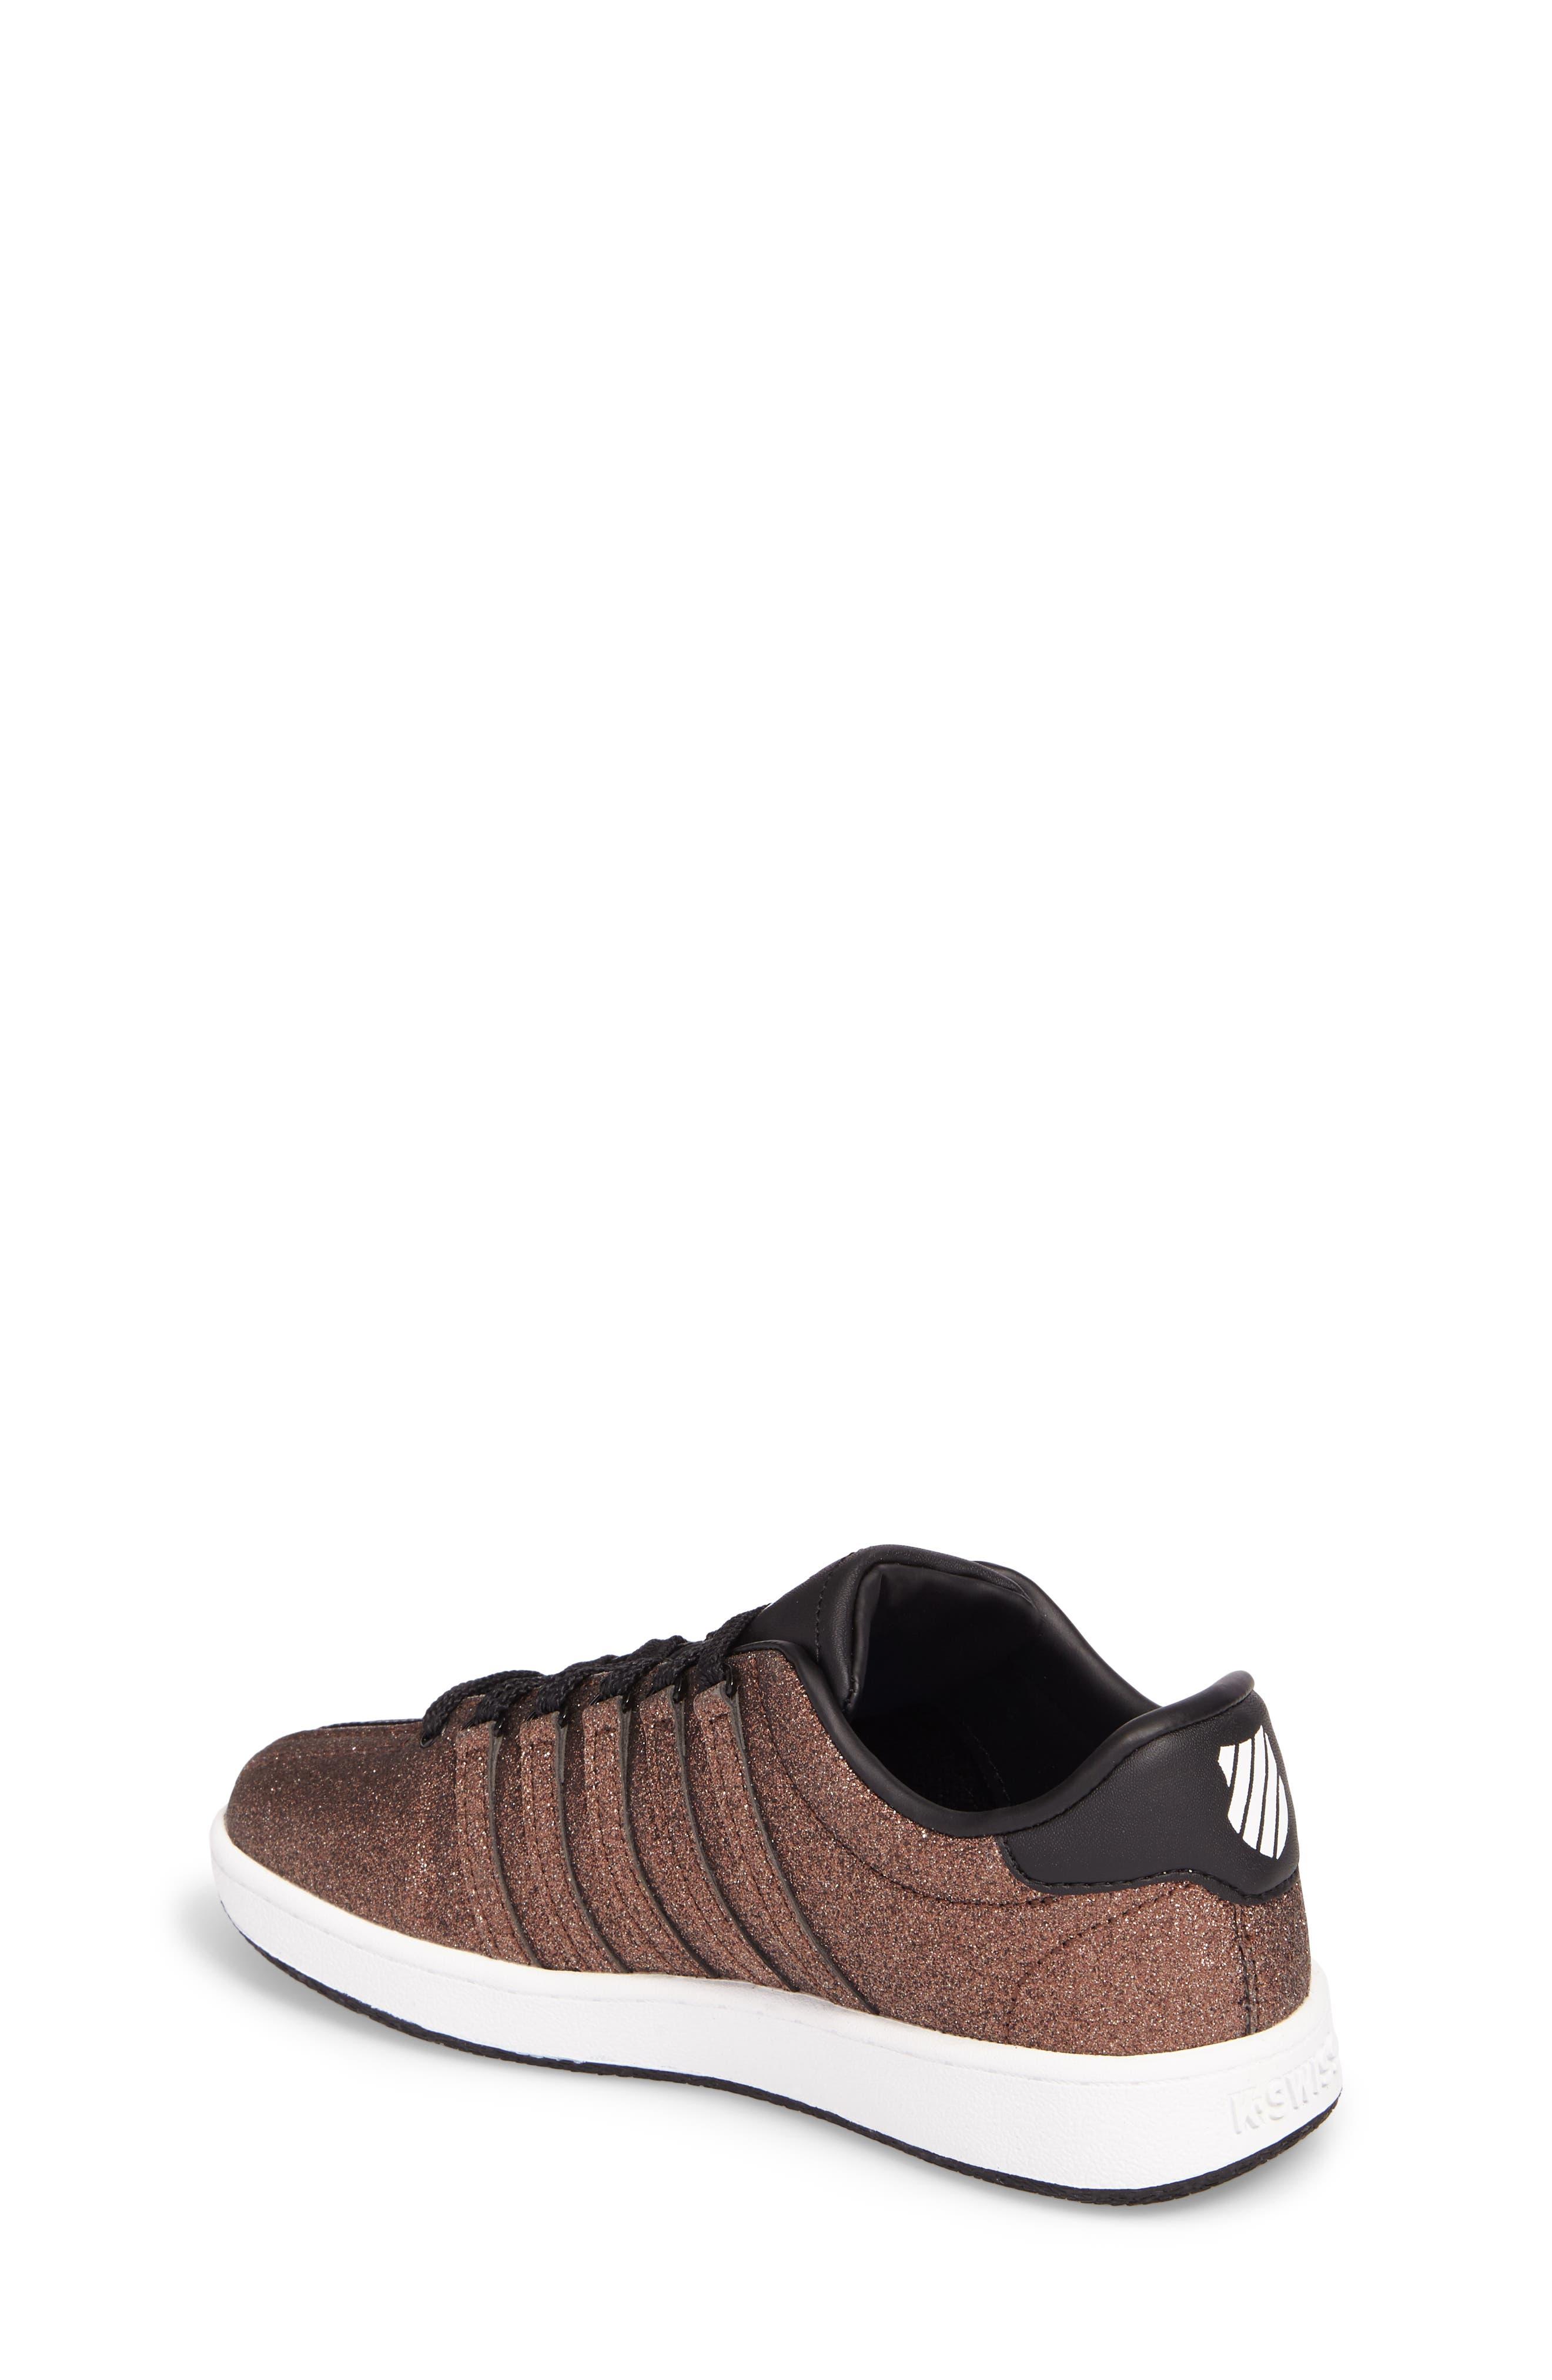 Alternate Image 2  - K-Swiss Classic VN Sparkle Low Top Sneaker (Baby, Walker, Toddler, Little Kid & Big Kid)